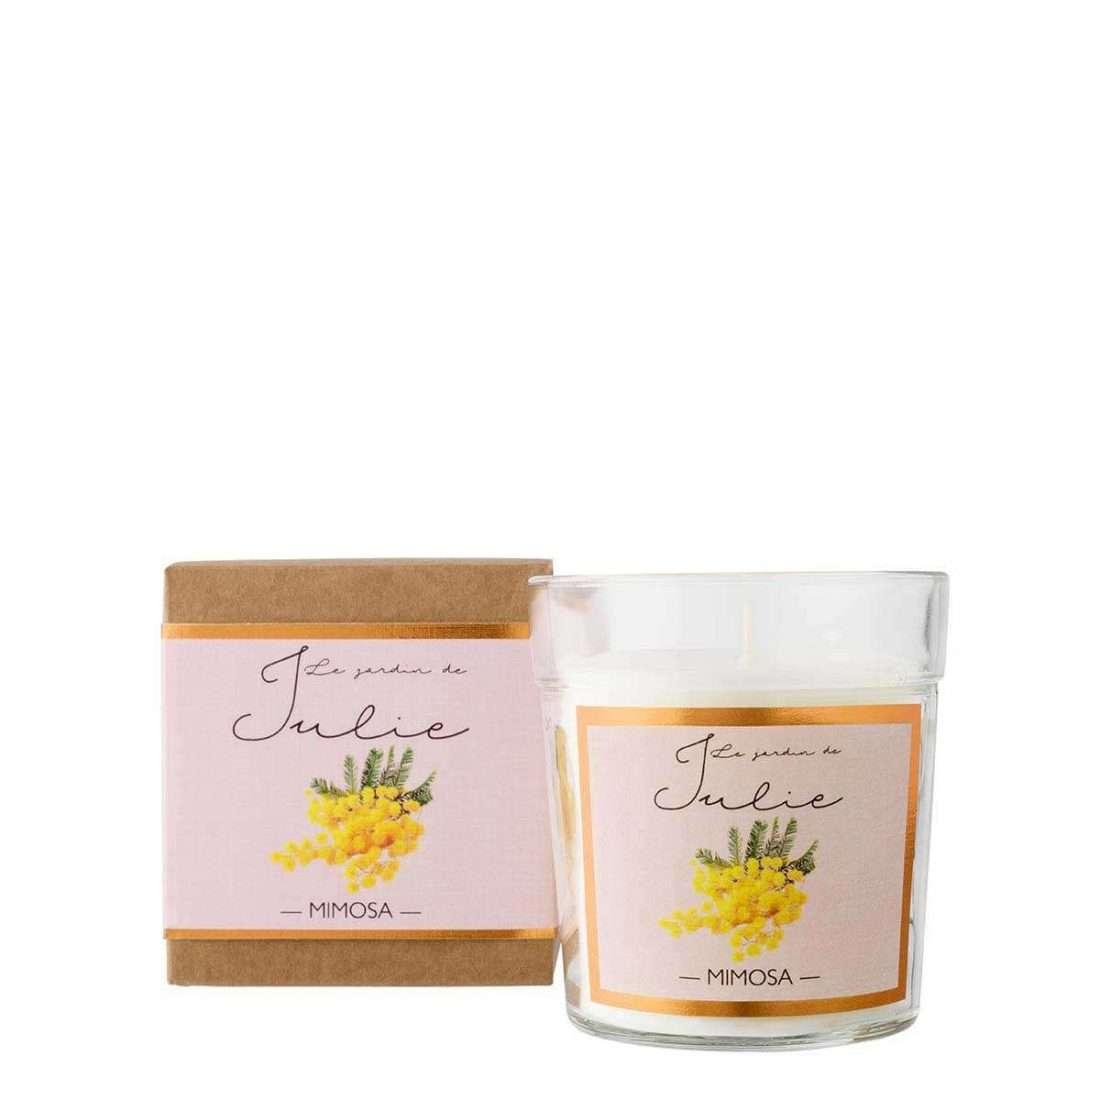 Ldgioy4s7wcykuzgkzrq Le Jardin De Julie Pot Parfumé Vela Aromática Aroma Mimosa 40h.jpg